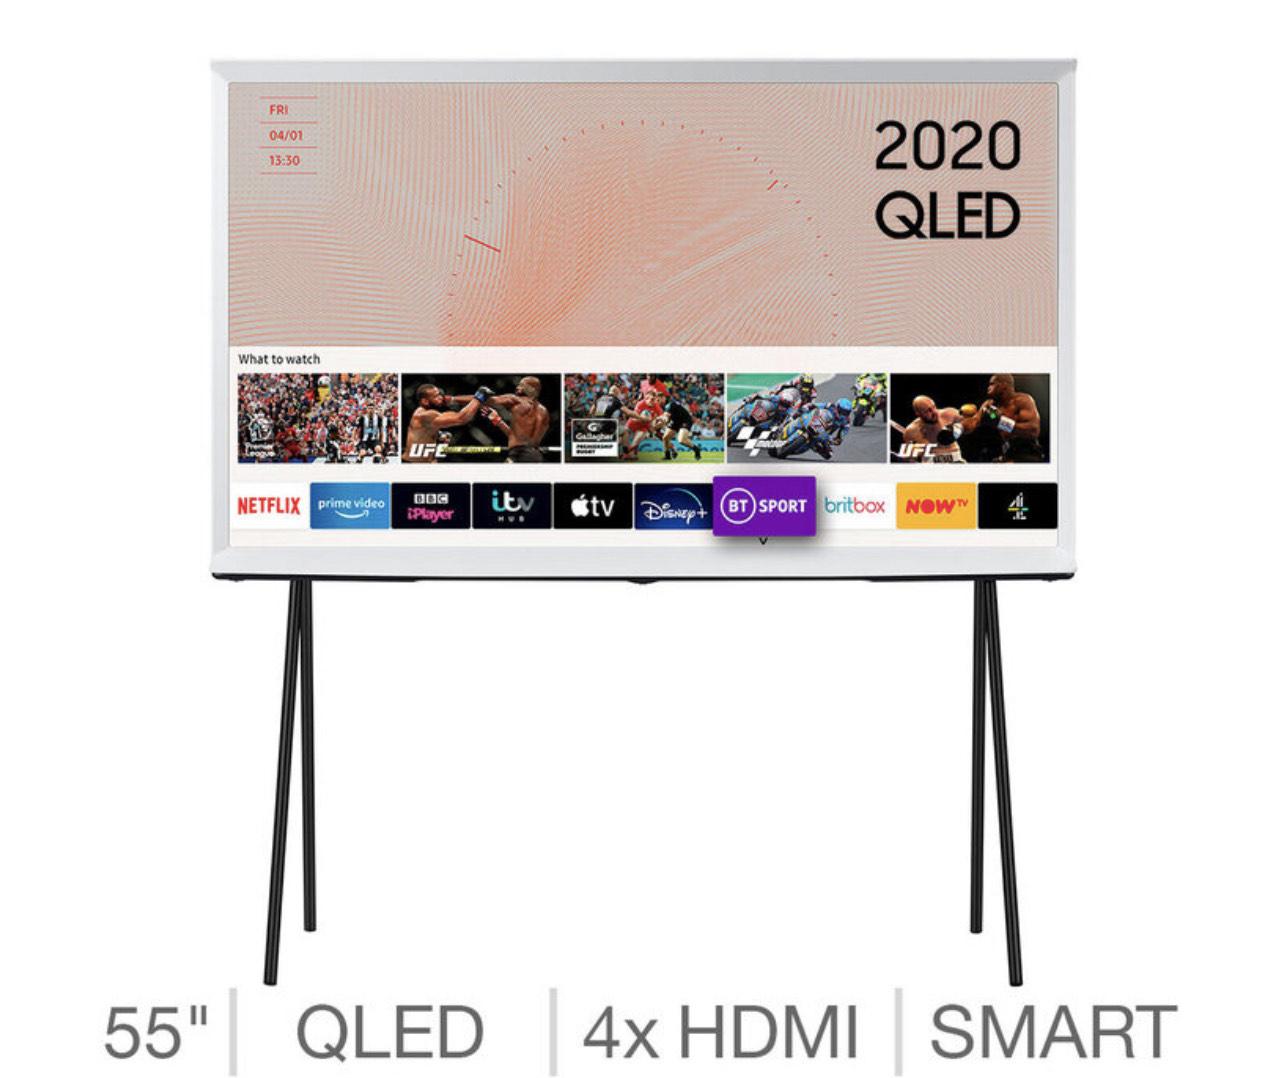 Samsung QE55LS01TAUXXU, The Serif, 55 Inch QLED 4K Ultra HD Smart TV - 5 Years Warranty £719.99 (Membership Required) @ Costco